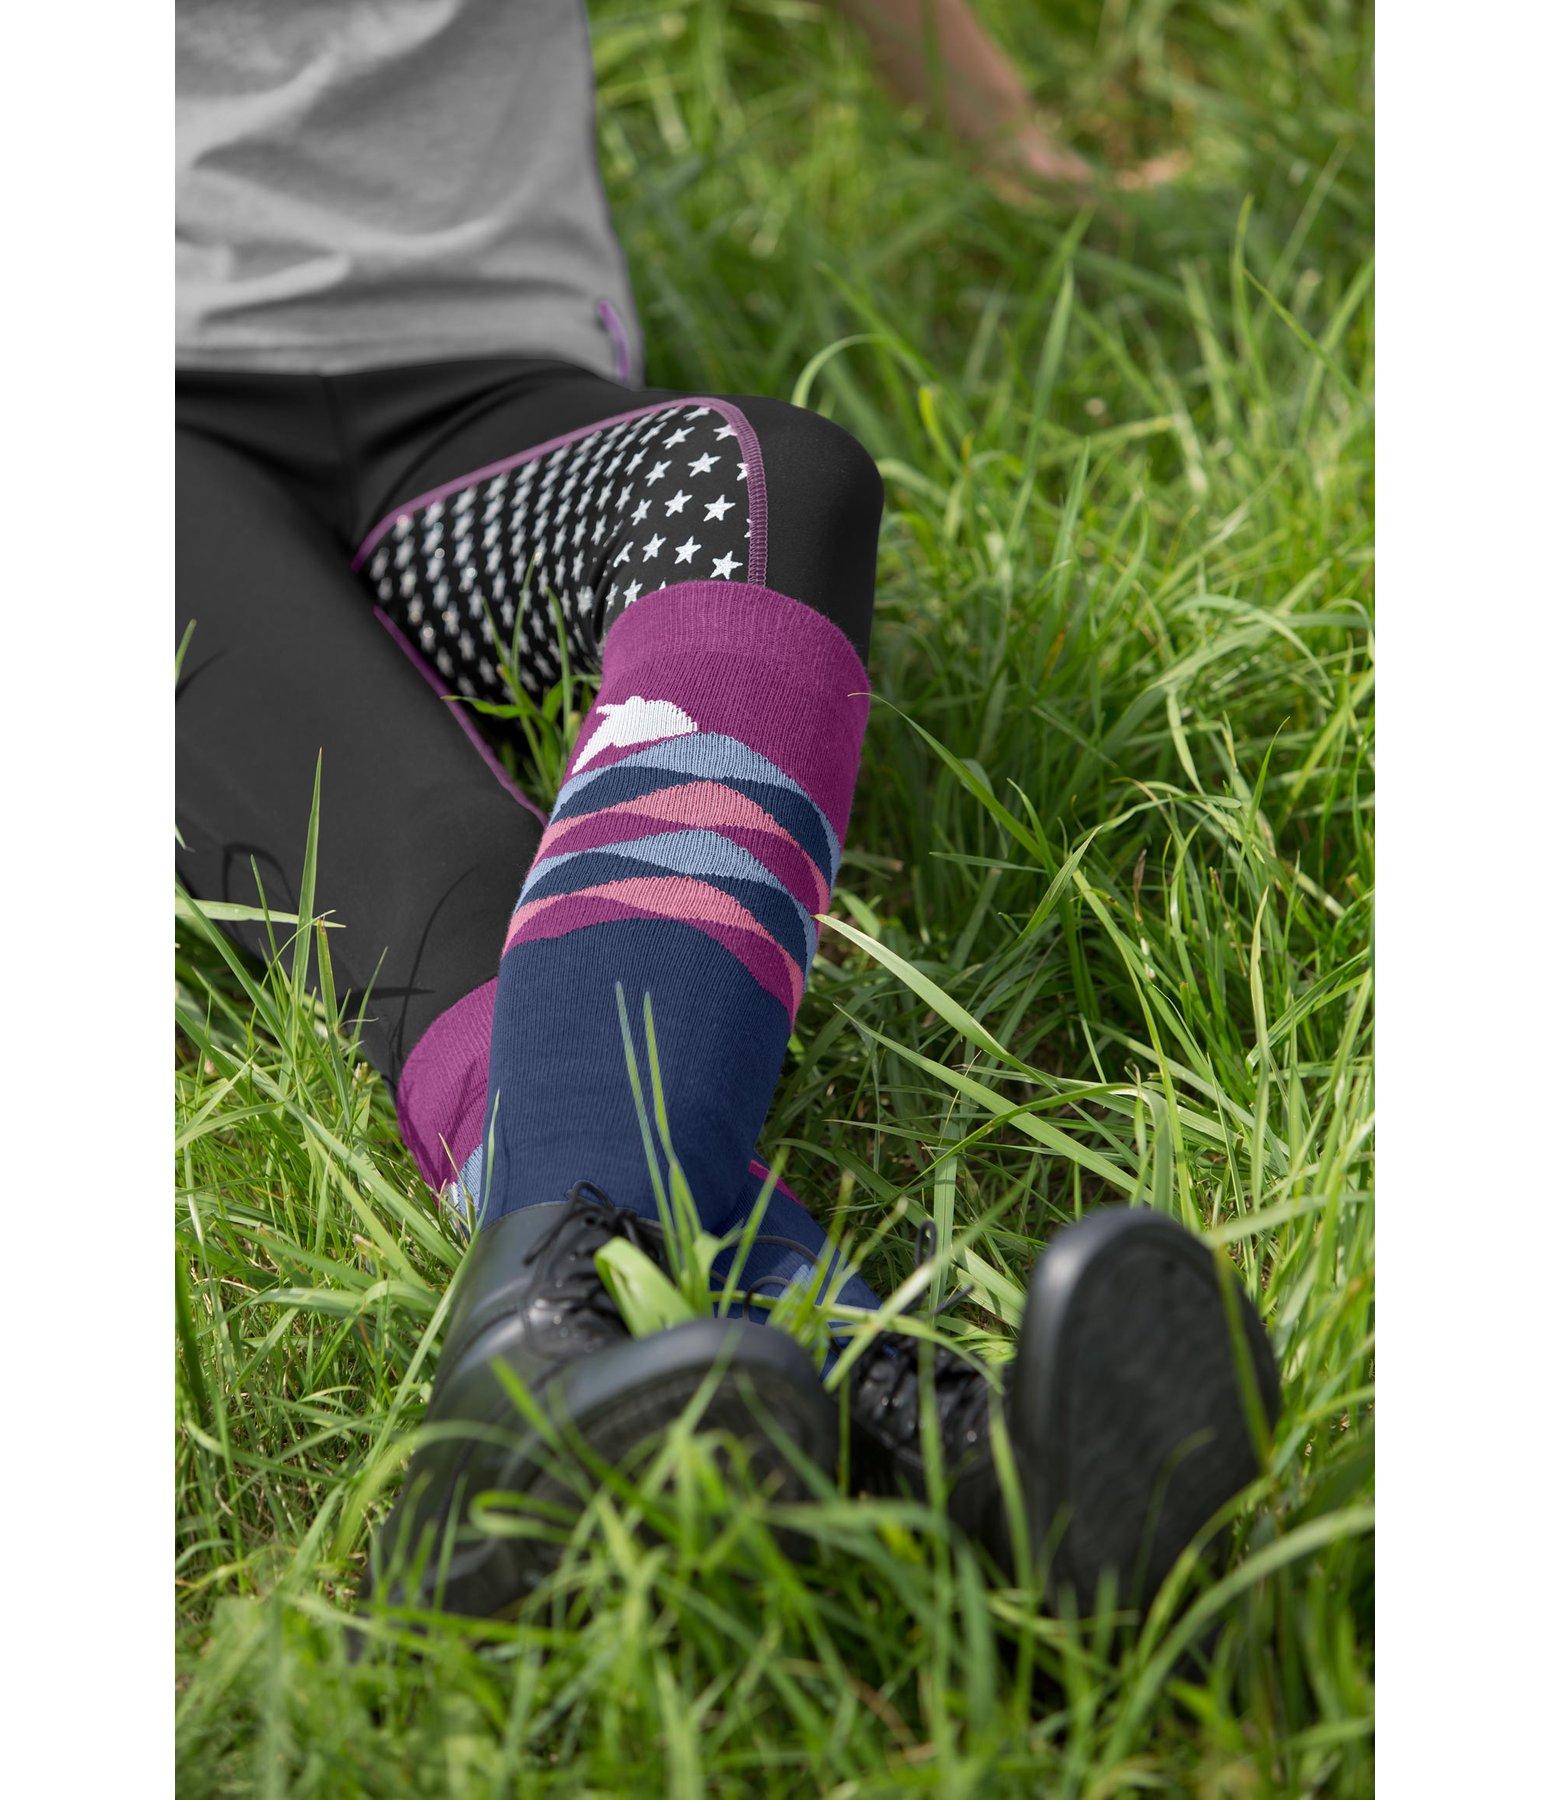 chaussettes hautes enfants licorne chaussettes kramer equitation. Black Bedroom Furniture Sets. Home Design Ideas